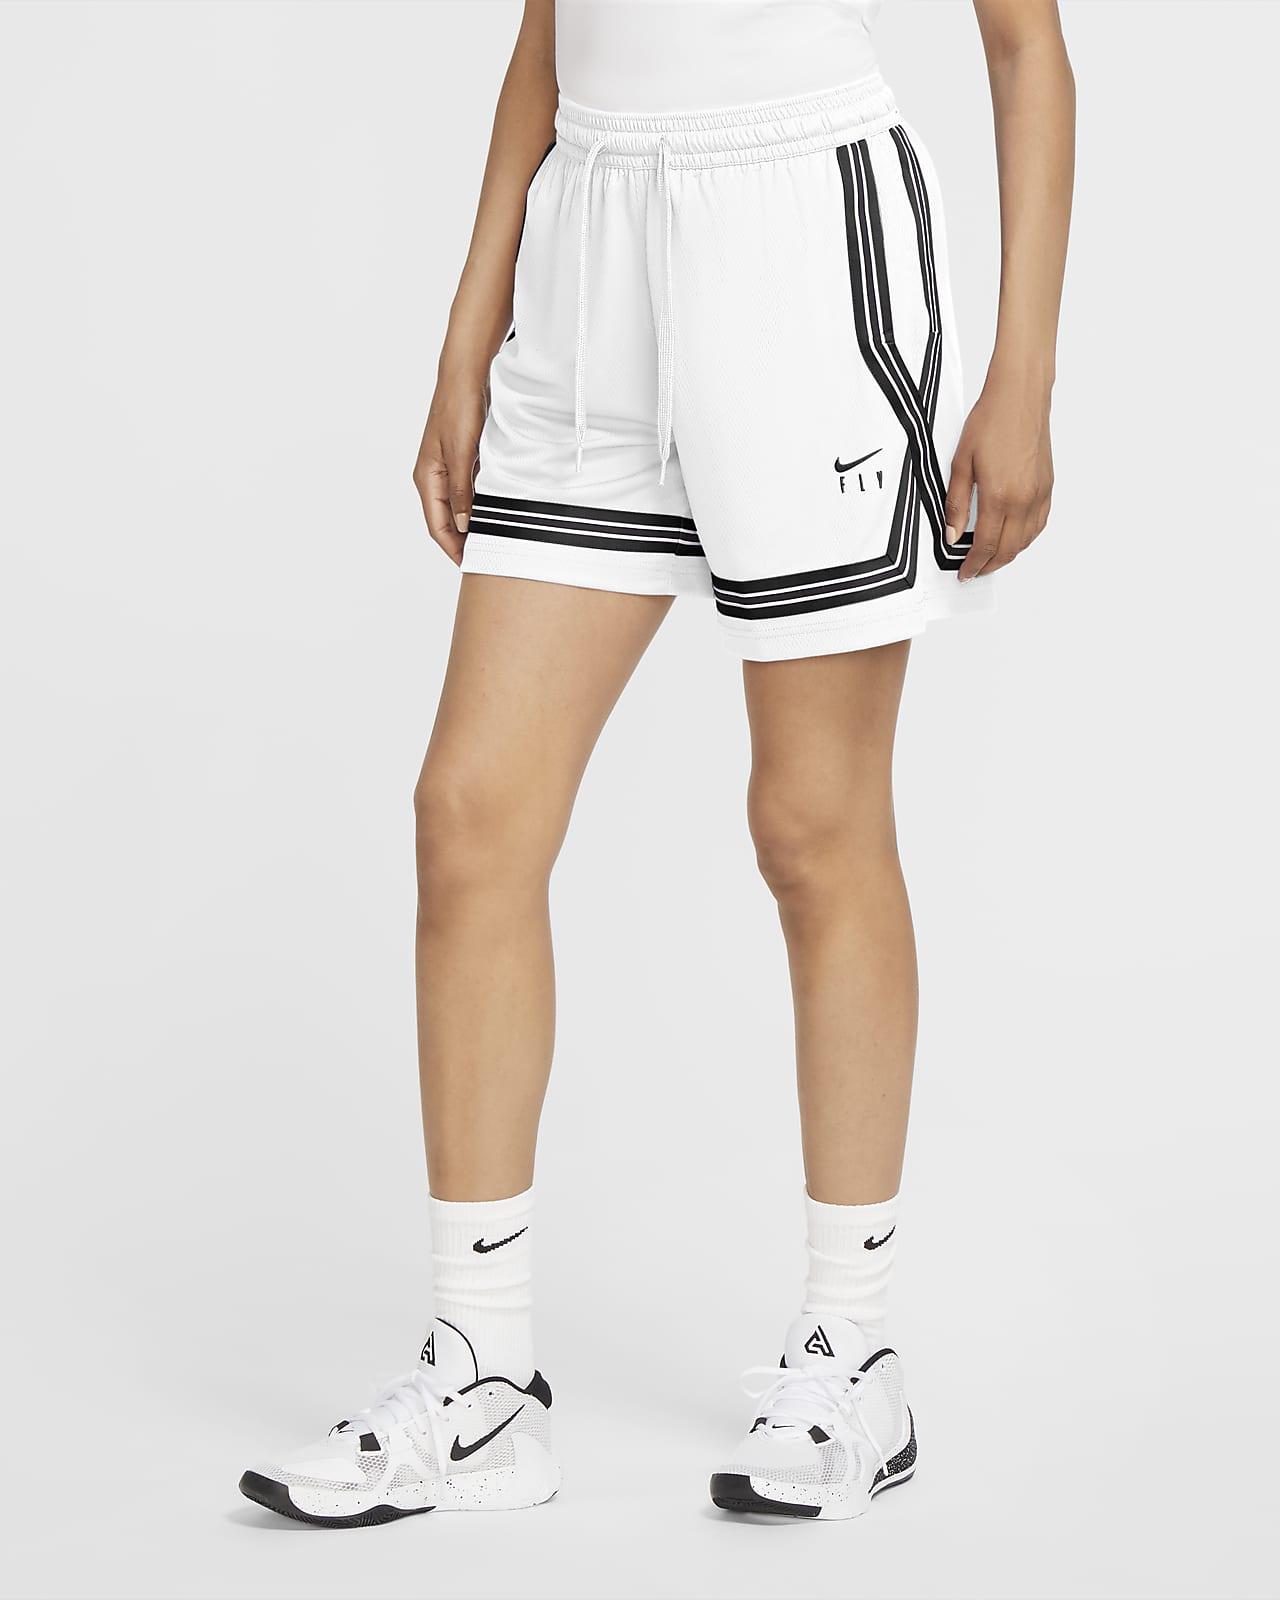 Shorts de básquetbol para mujer Nike Dri-FIT Swoosh Fly